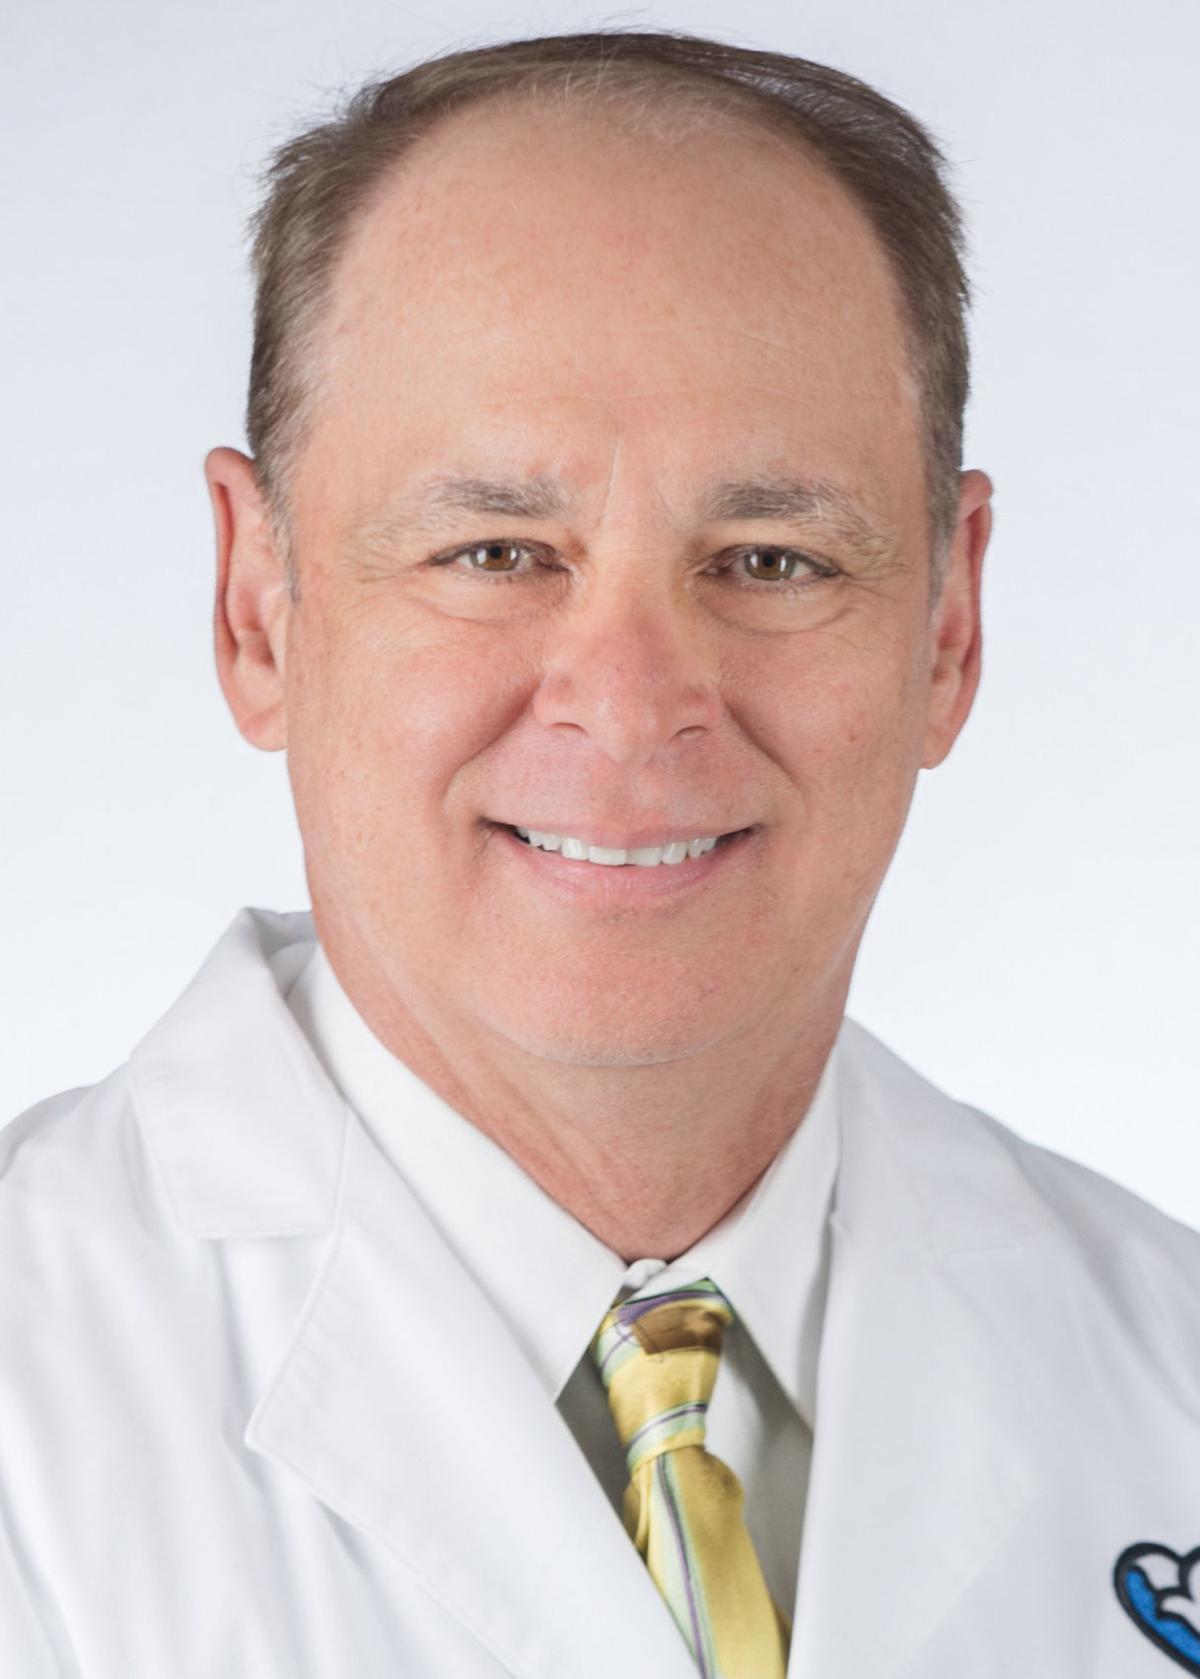 Norman Ferrer, MD